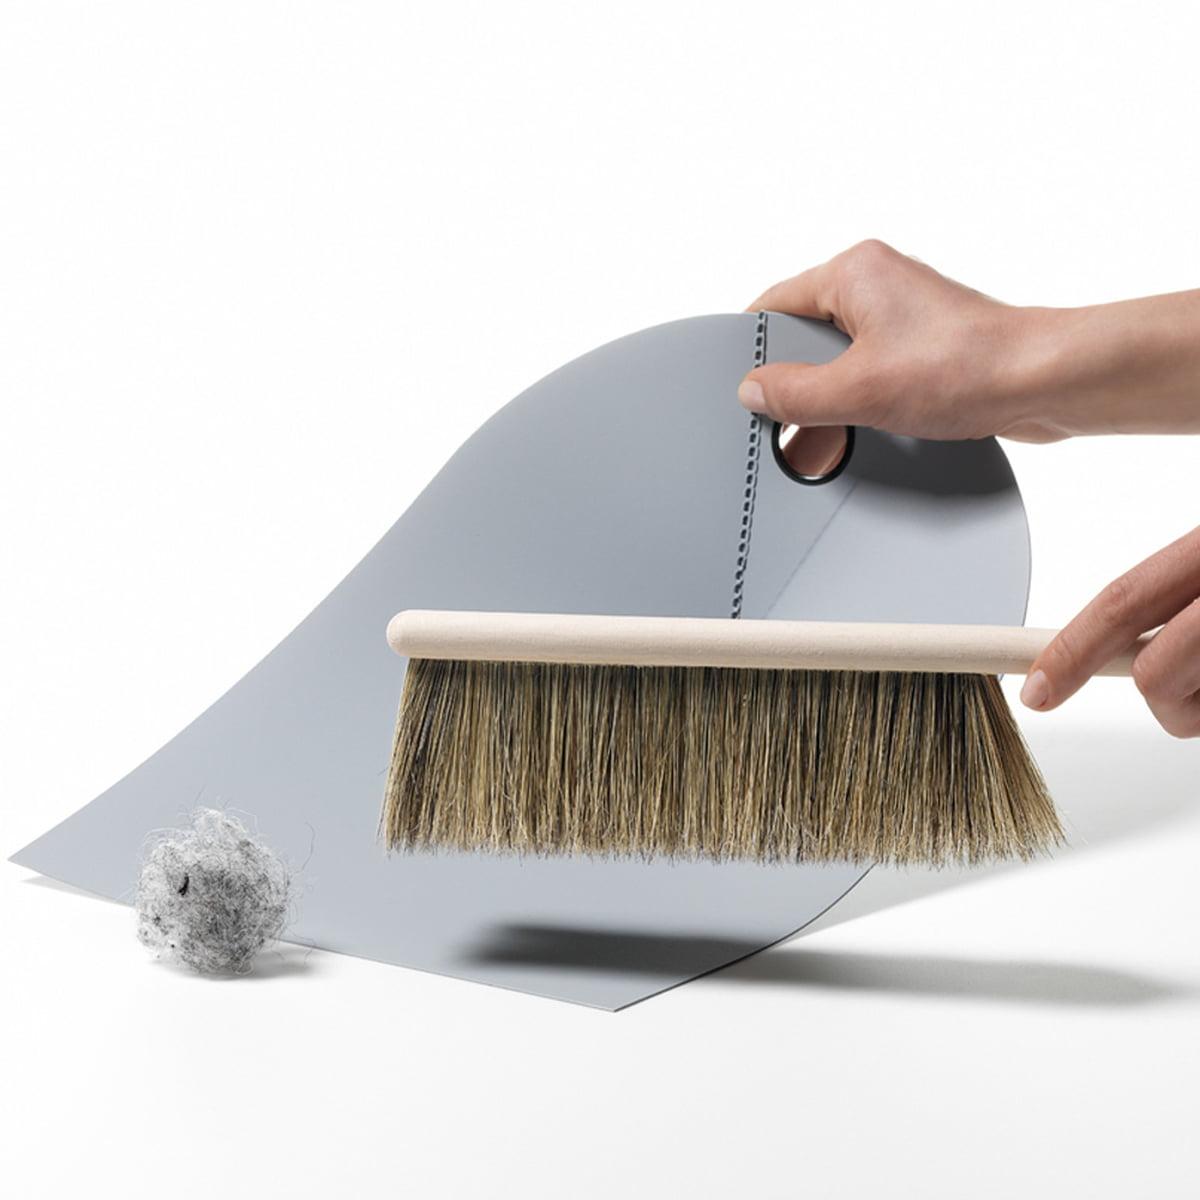 normann copenhagen handfeger und kehrblech. Black Bedroom Furniture Sets. Home Design Ideas